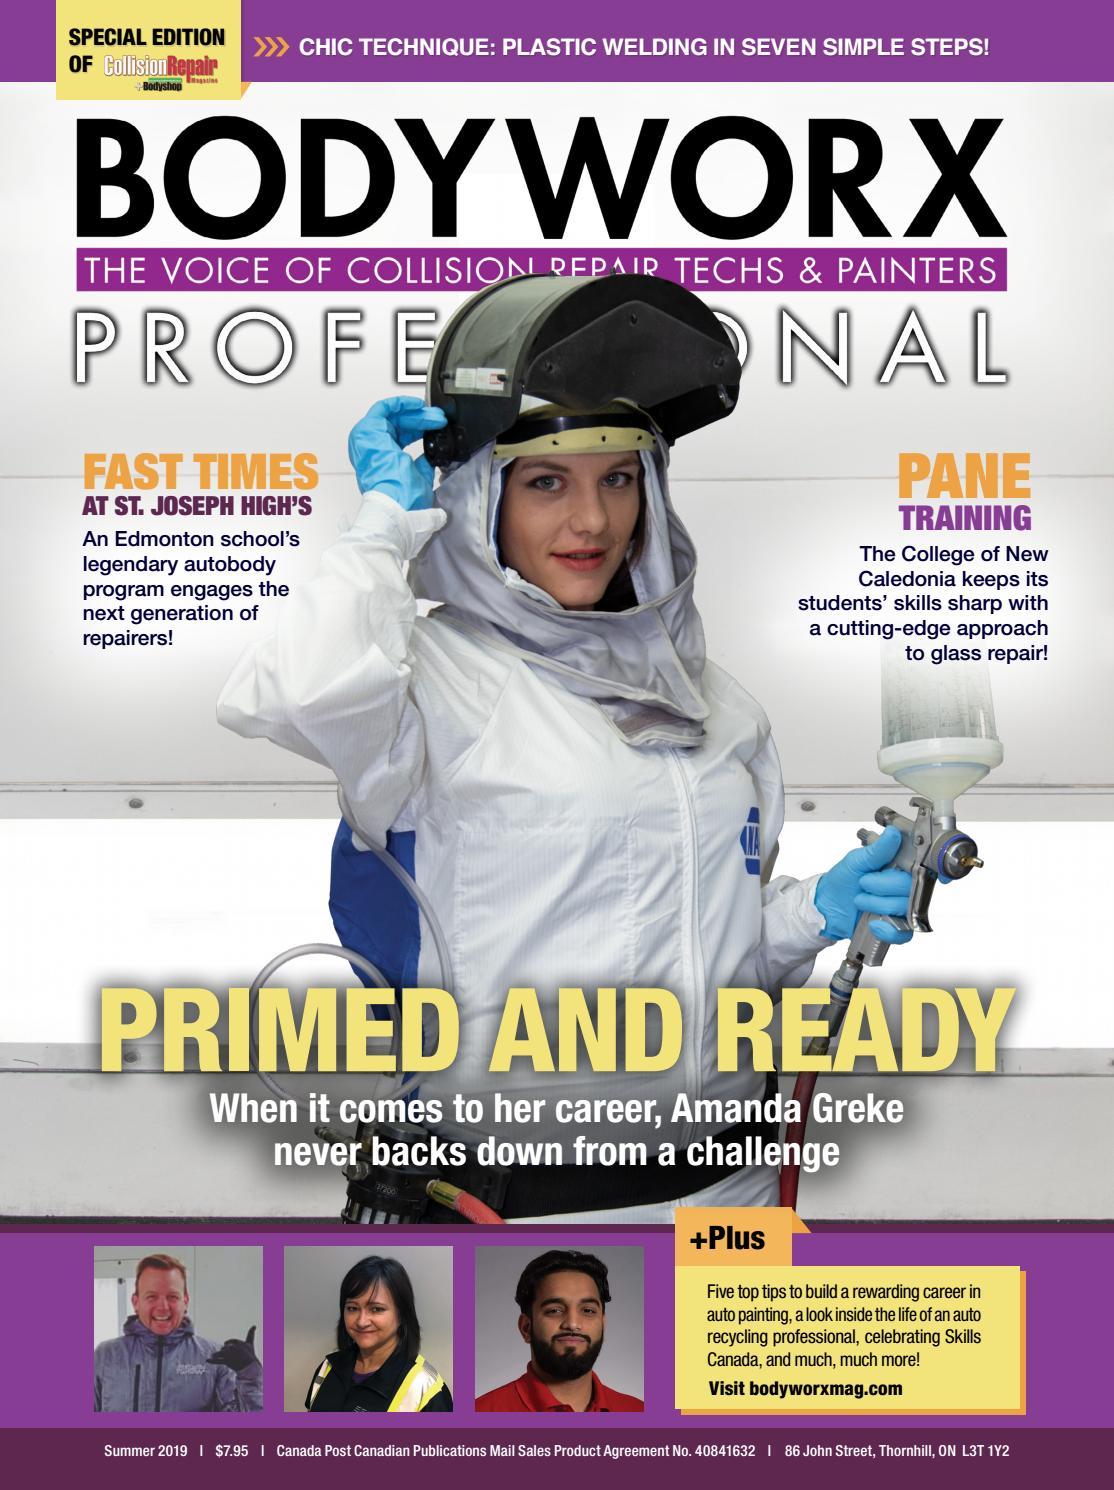 Bodyworx Professional 6#1 by Media Matters - issuu